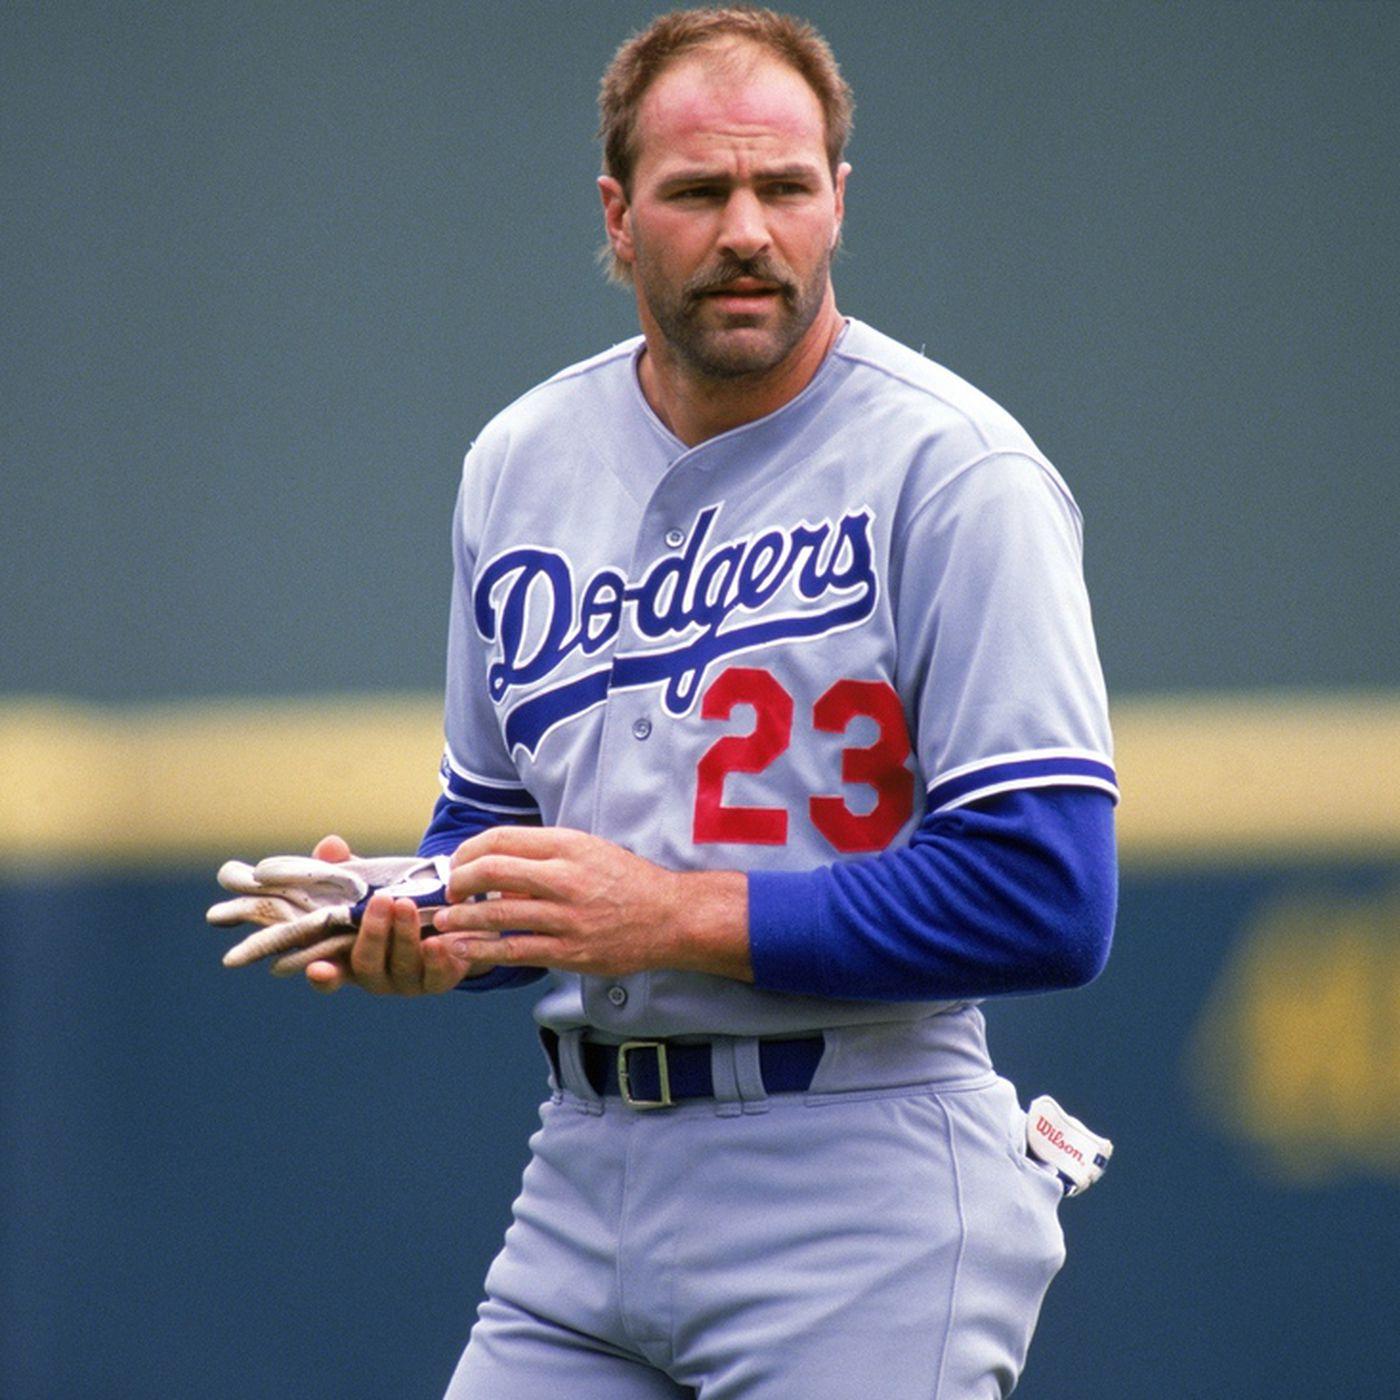 1988 Dodgers Week 18 review: Kirk Gibson joins 20-20 club - True Blue LA